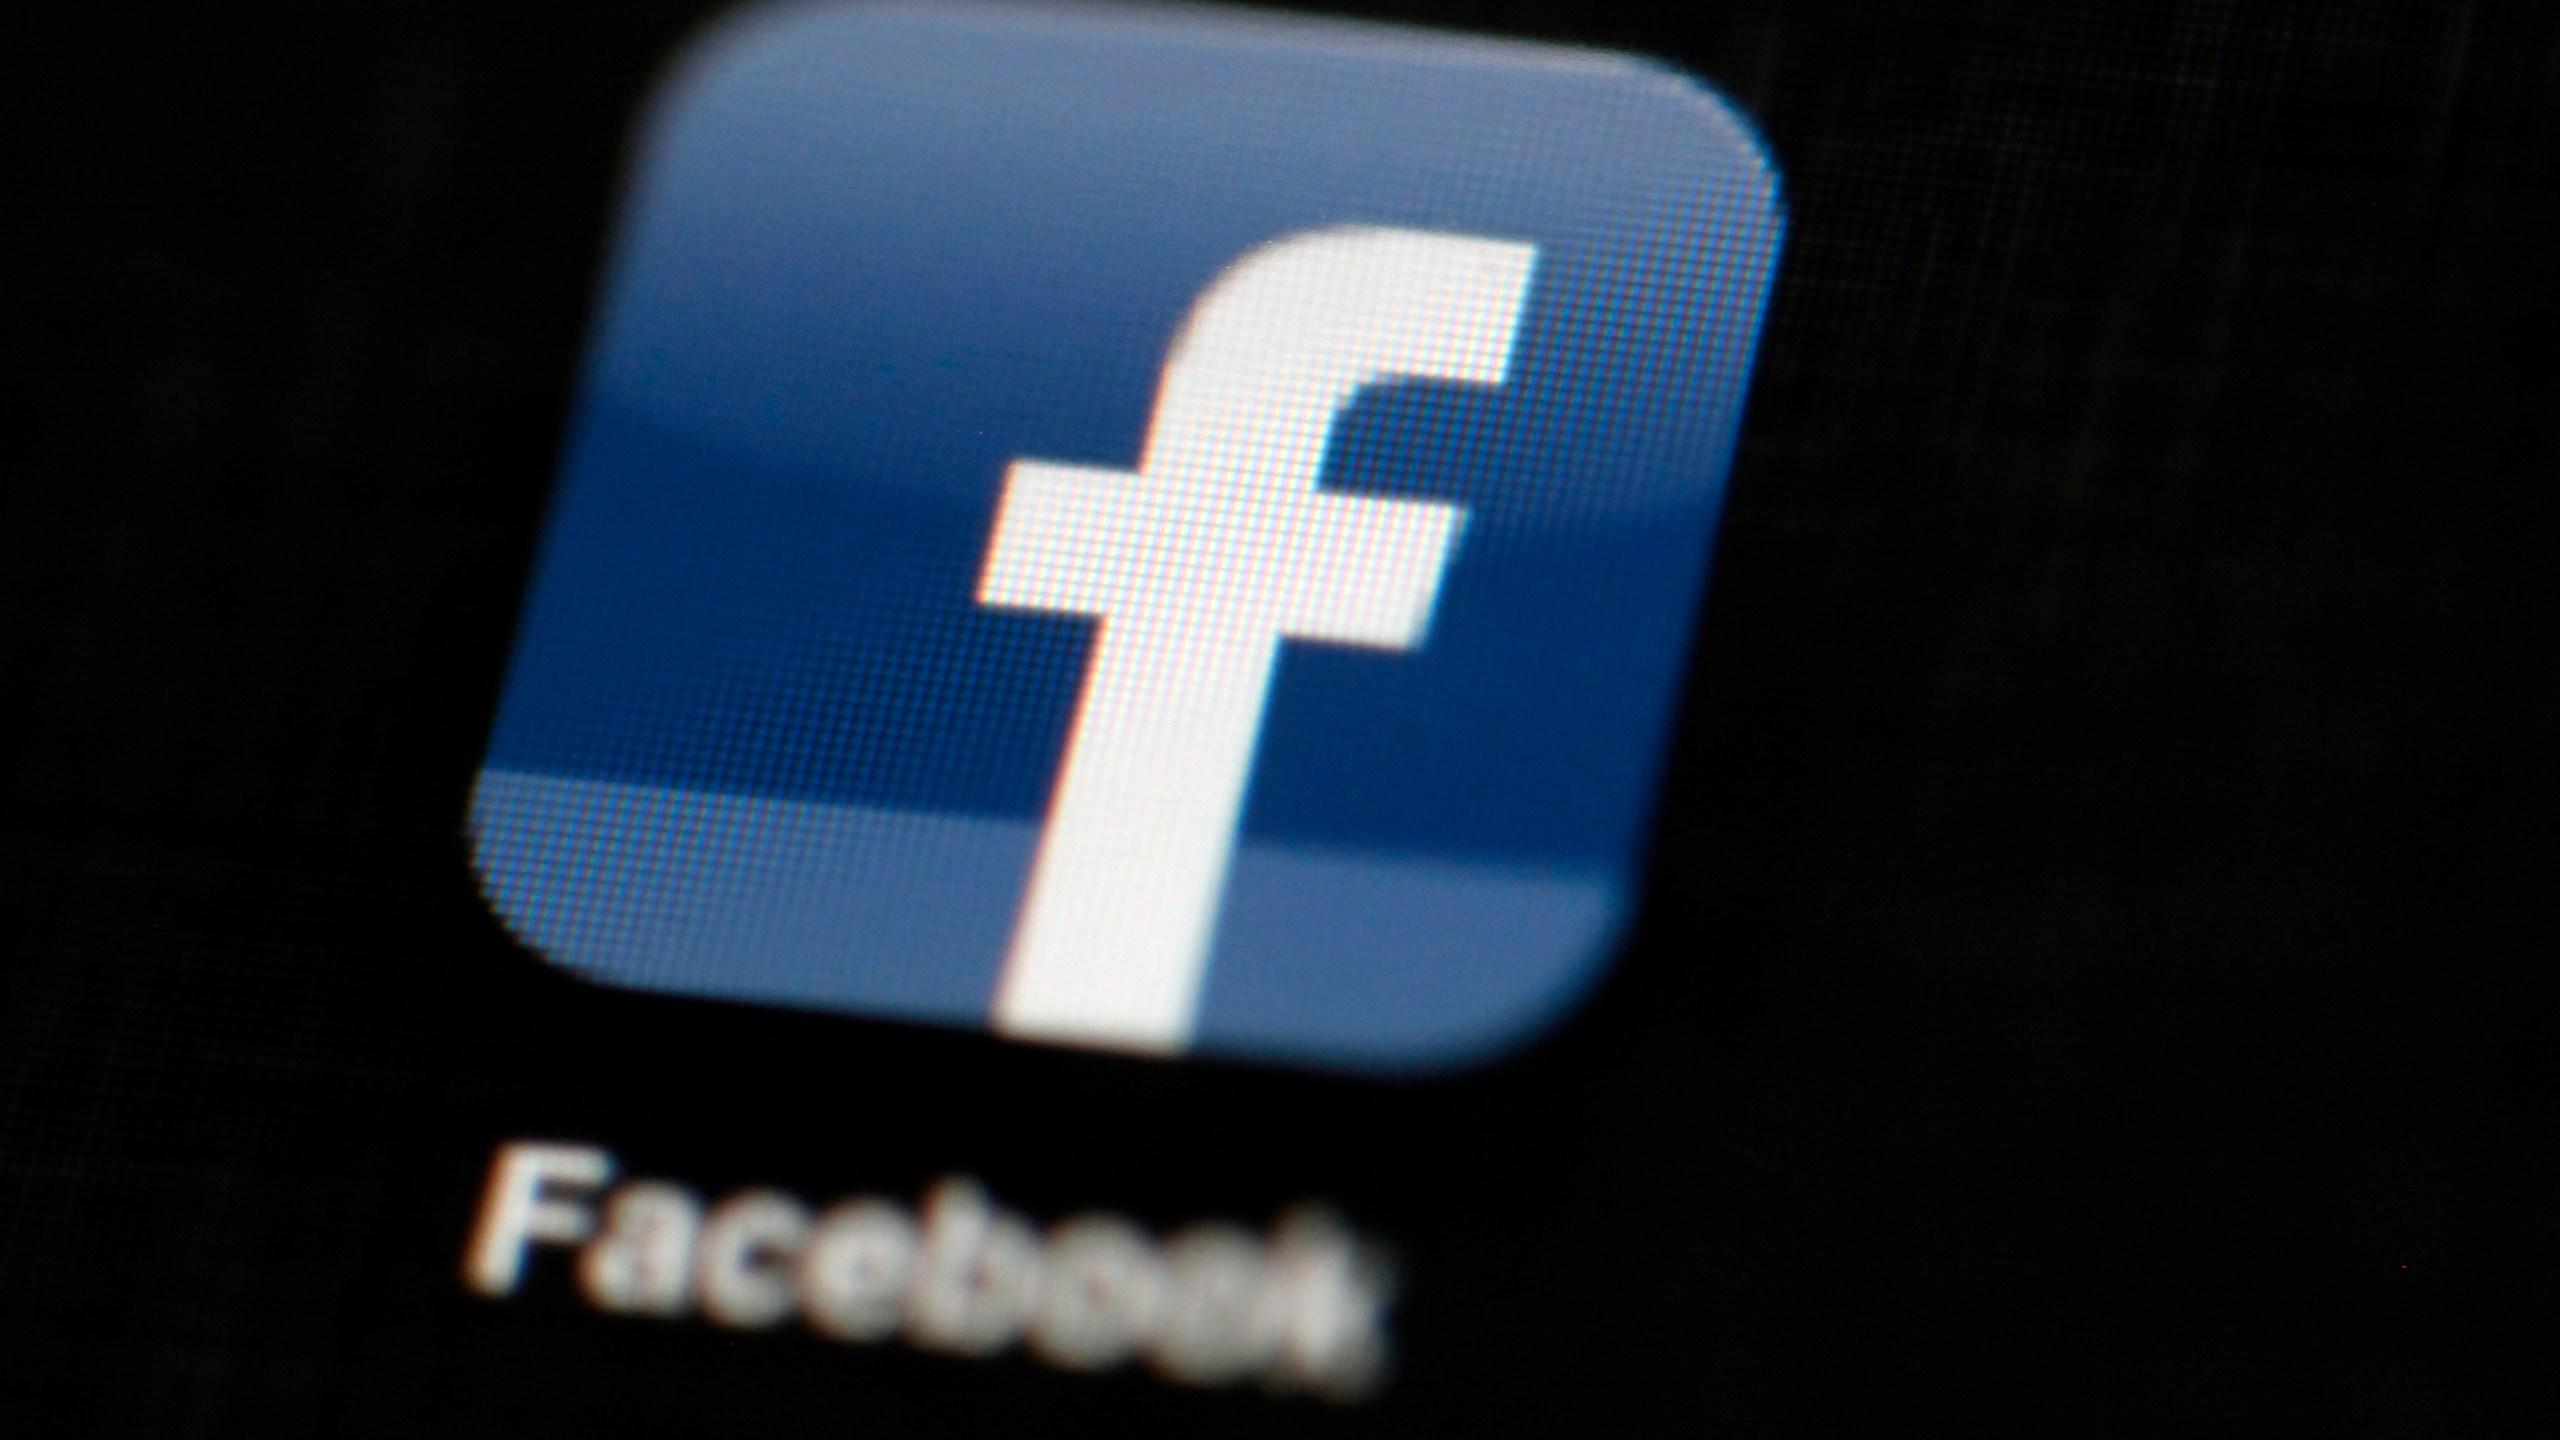 Facebook_Privacy_Scandal_87803-159532.jpg66174913